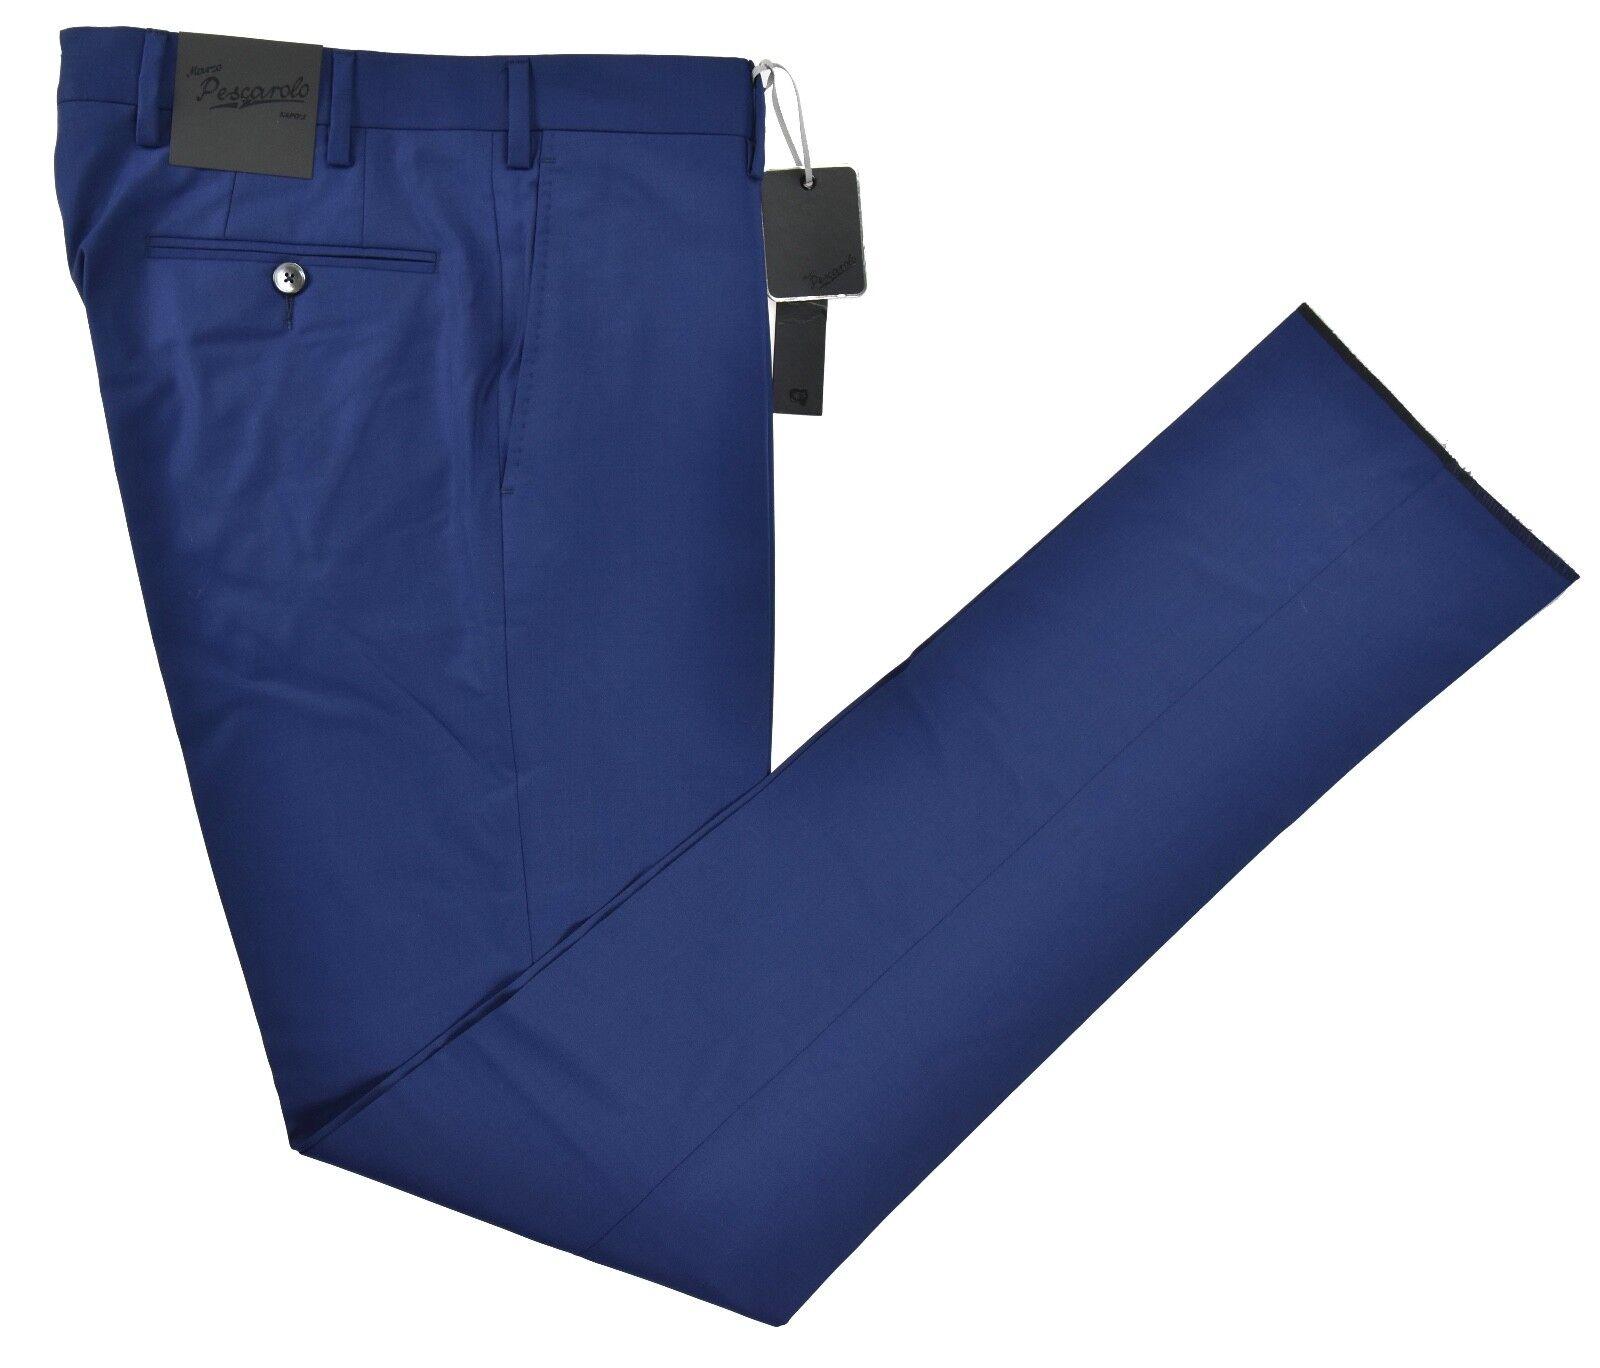 NEW 2018 MARCO PESCAROLO DRESS PANT 100% WOOL 120'S  SZ 33 US 49 PES8